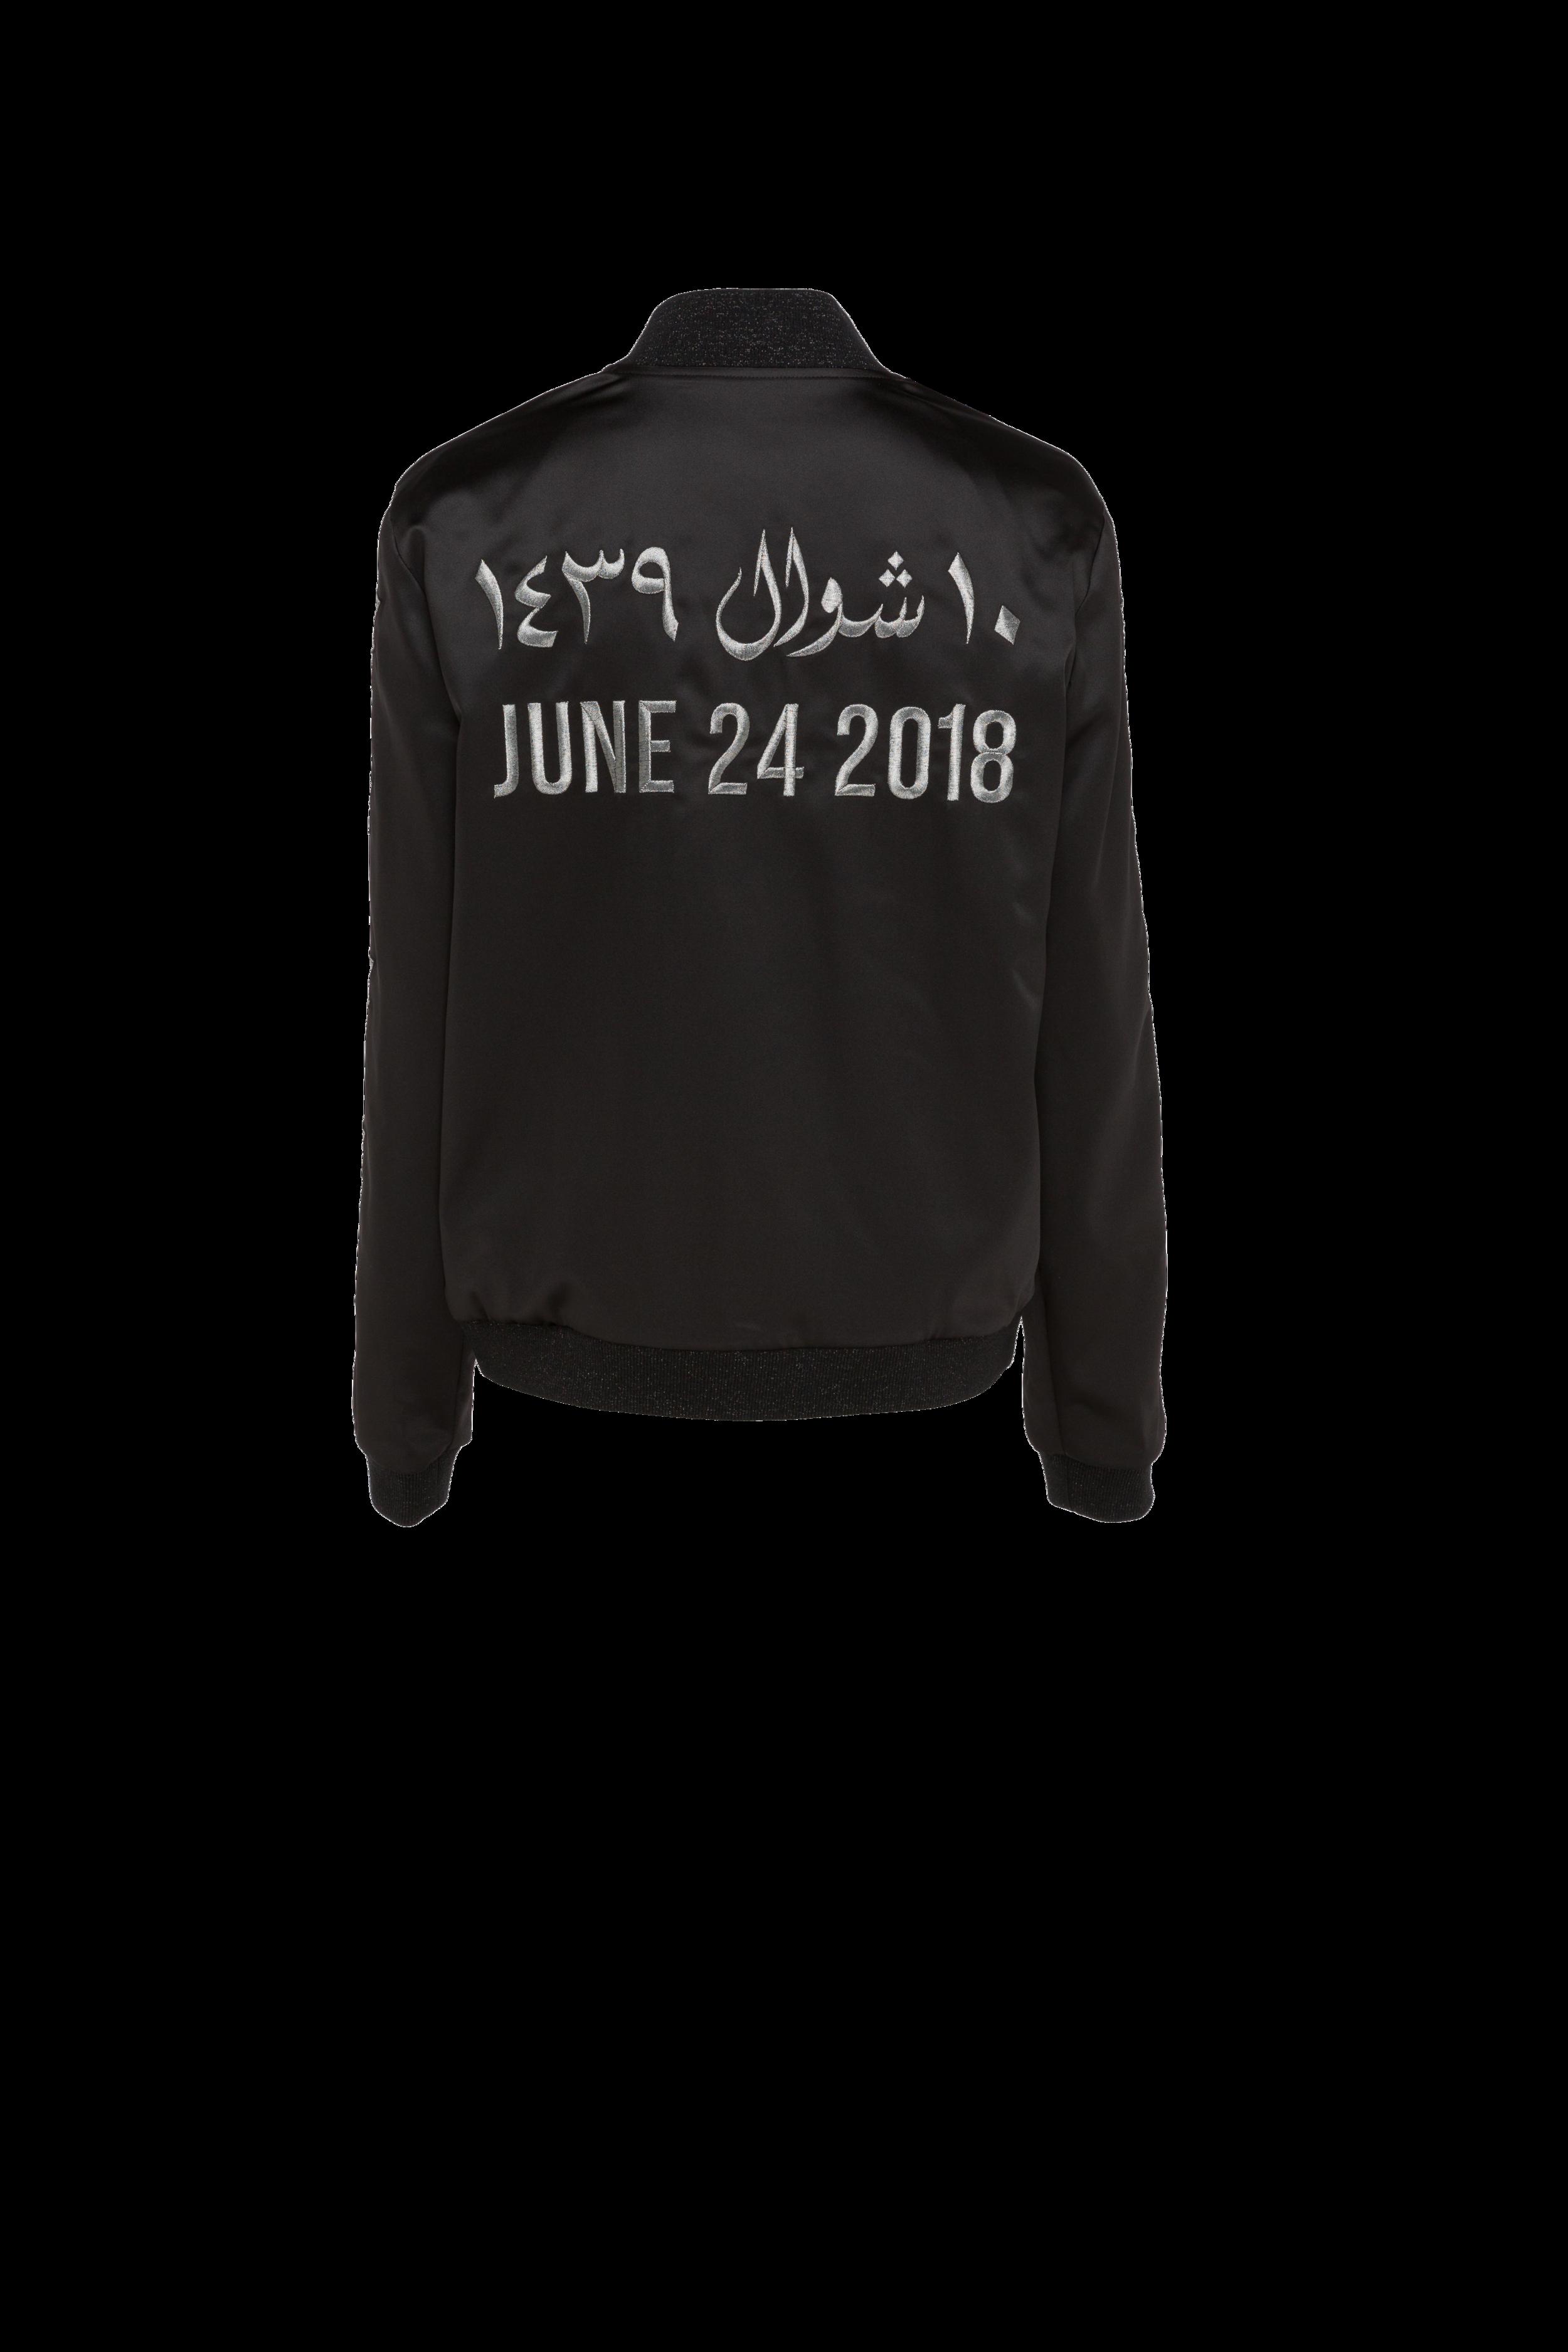 June 24 Driving Jacket Black/Platinum (UNISEX)